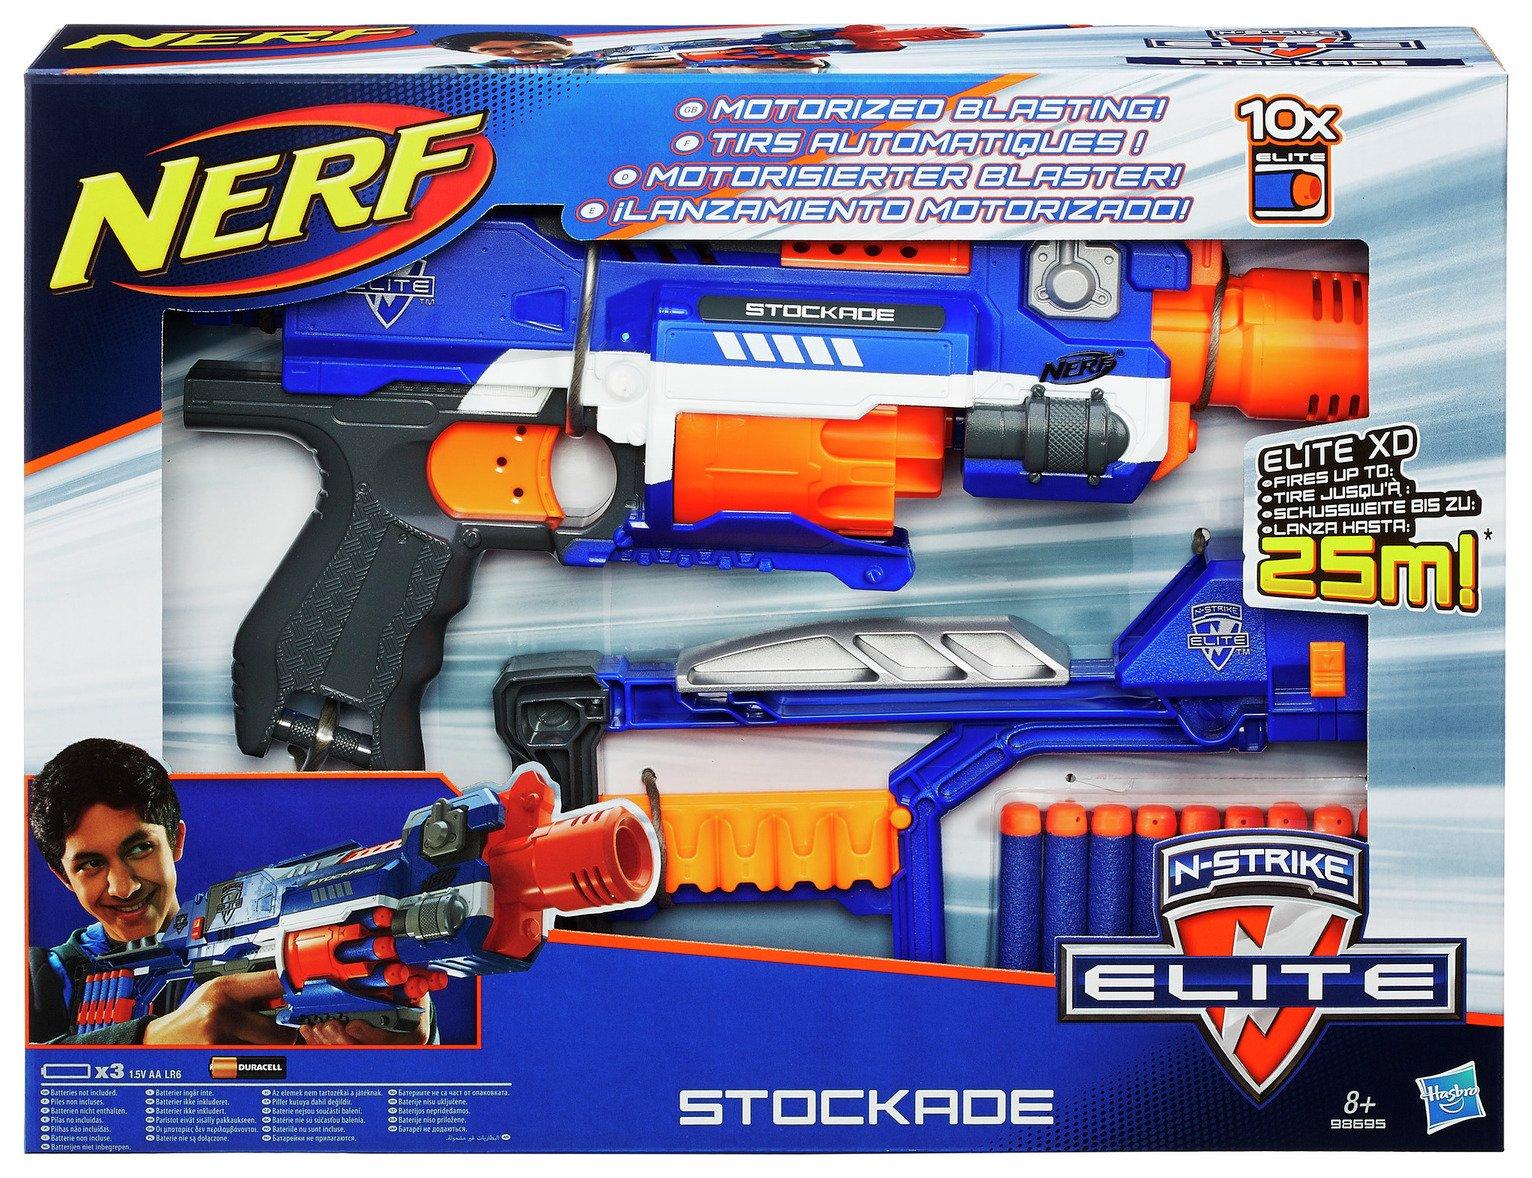 Nerf N-Strike Elite Stockade Blaster £12.99 @ ARGOS